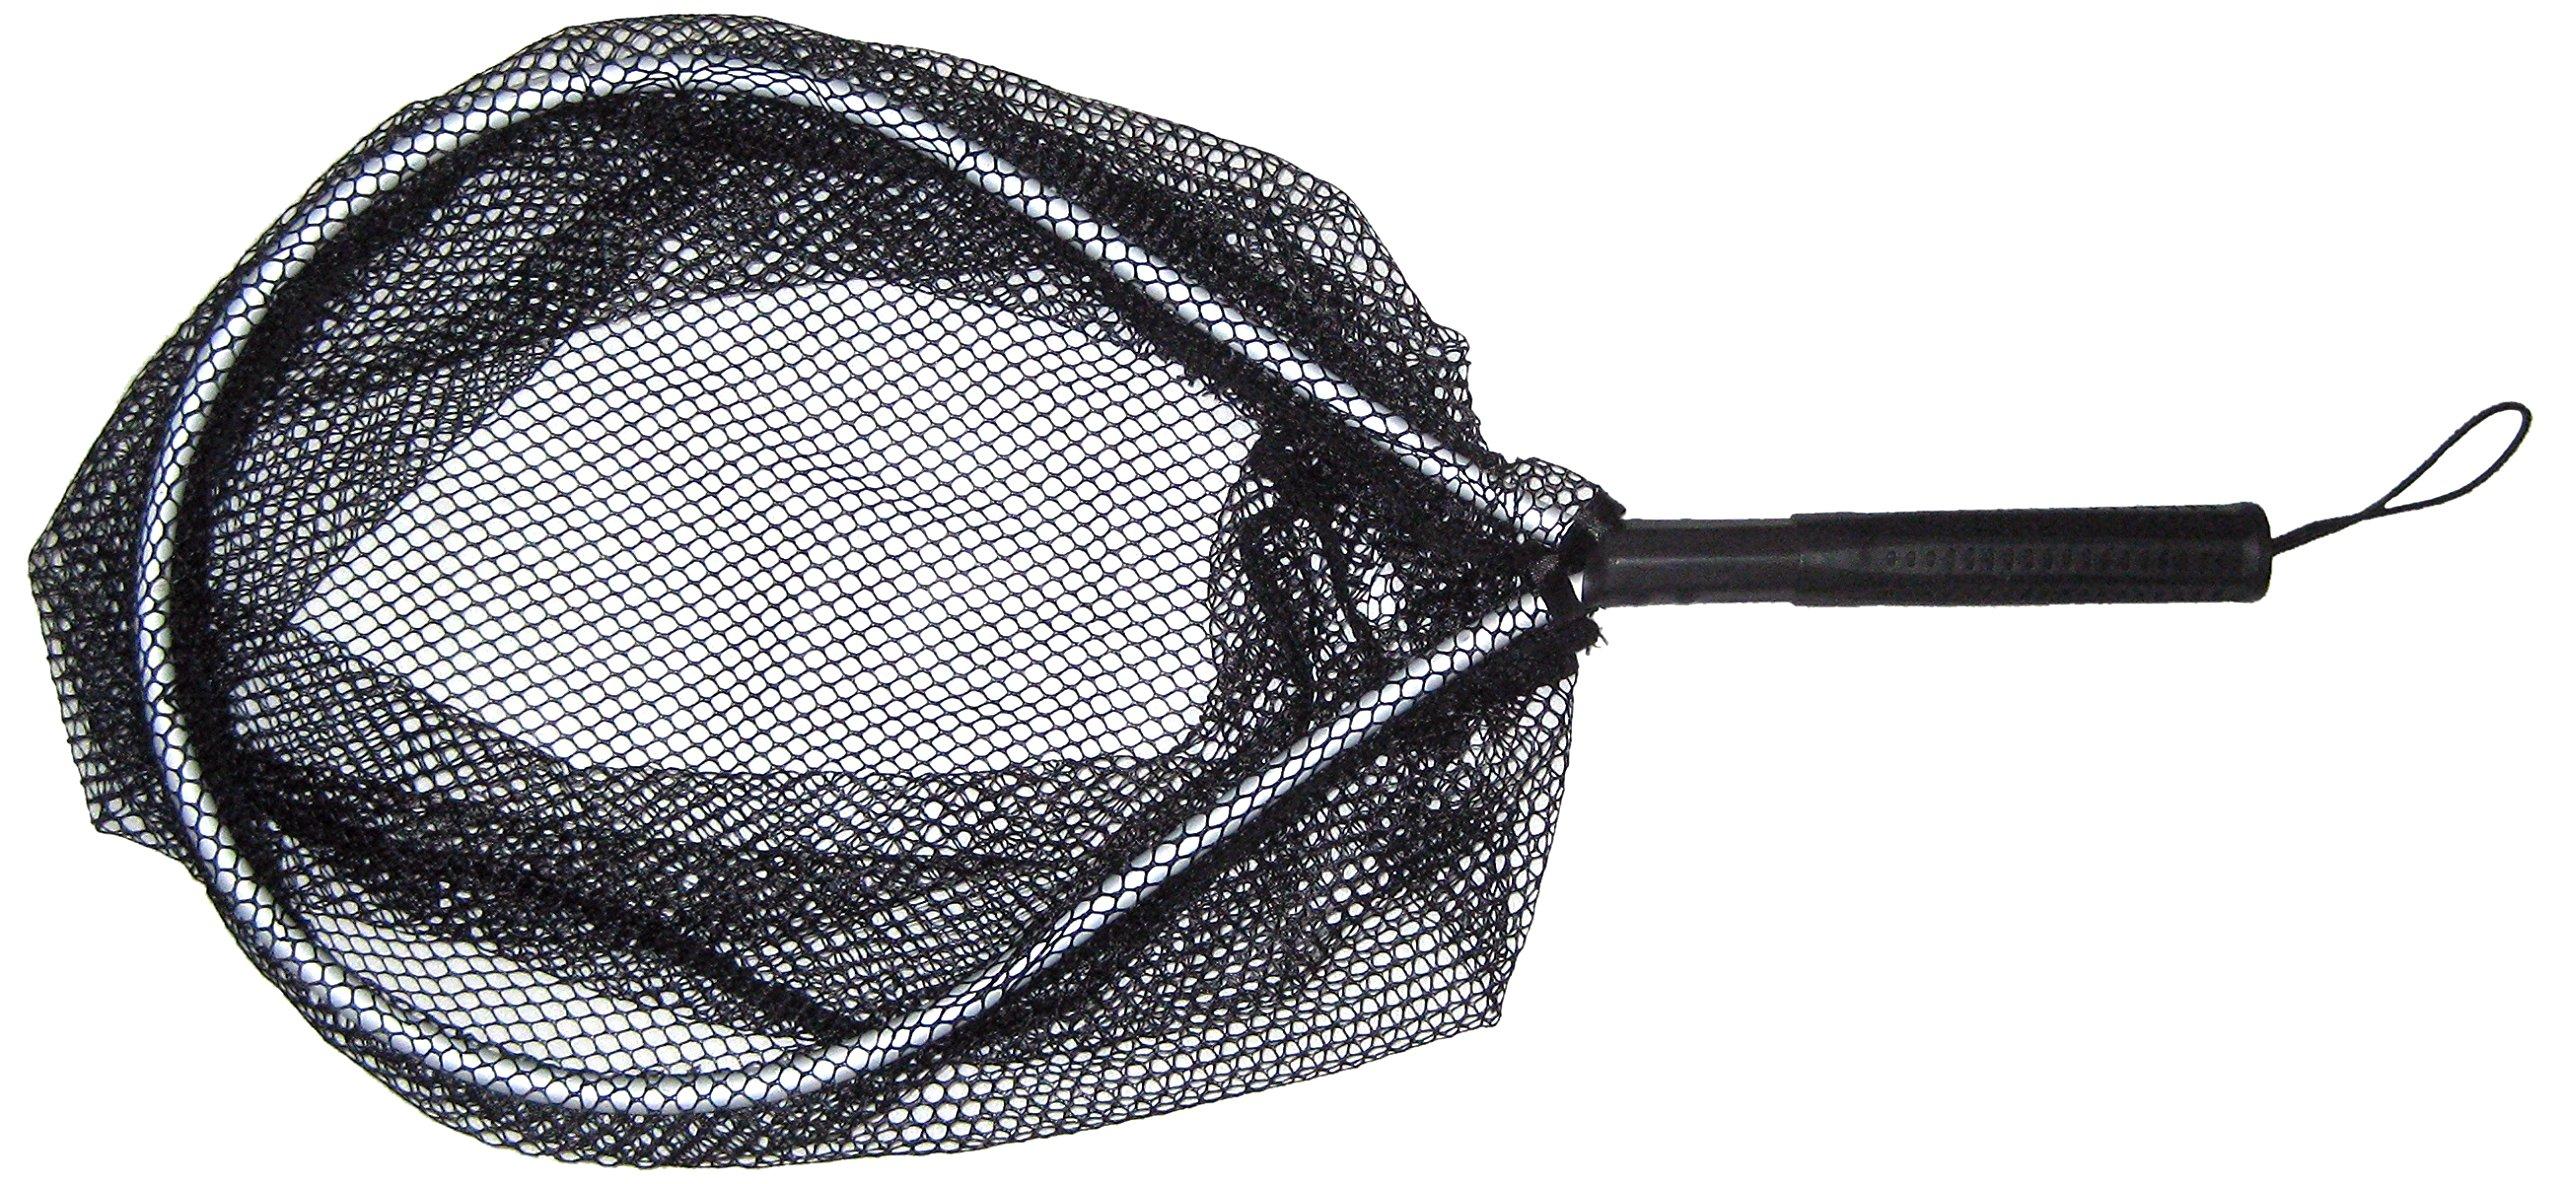 KUFA Aluminum Landing Net hoop:11''x15'' handle 7'' 7 oz LND204